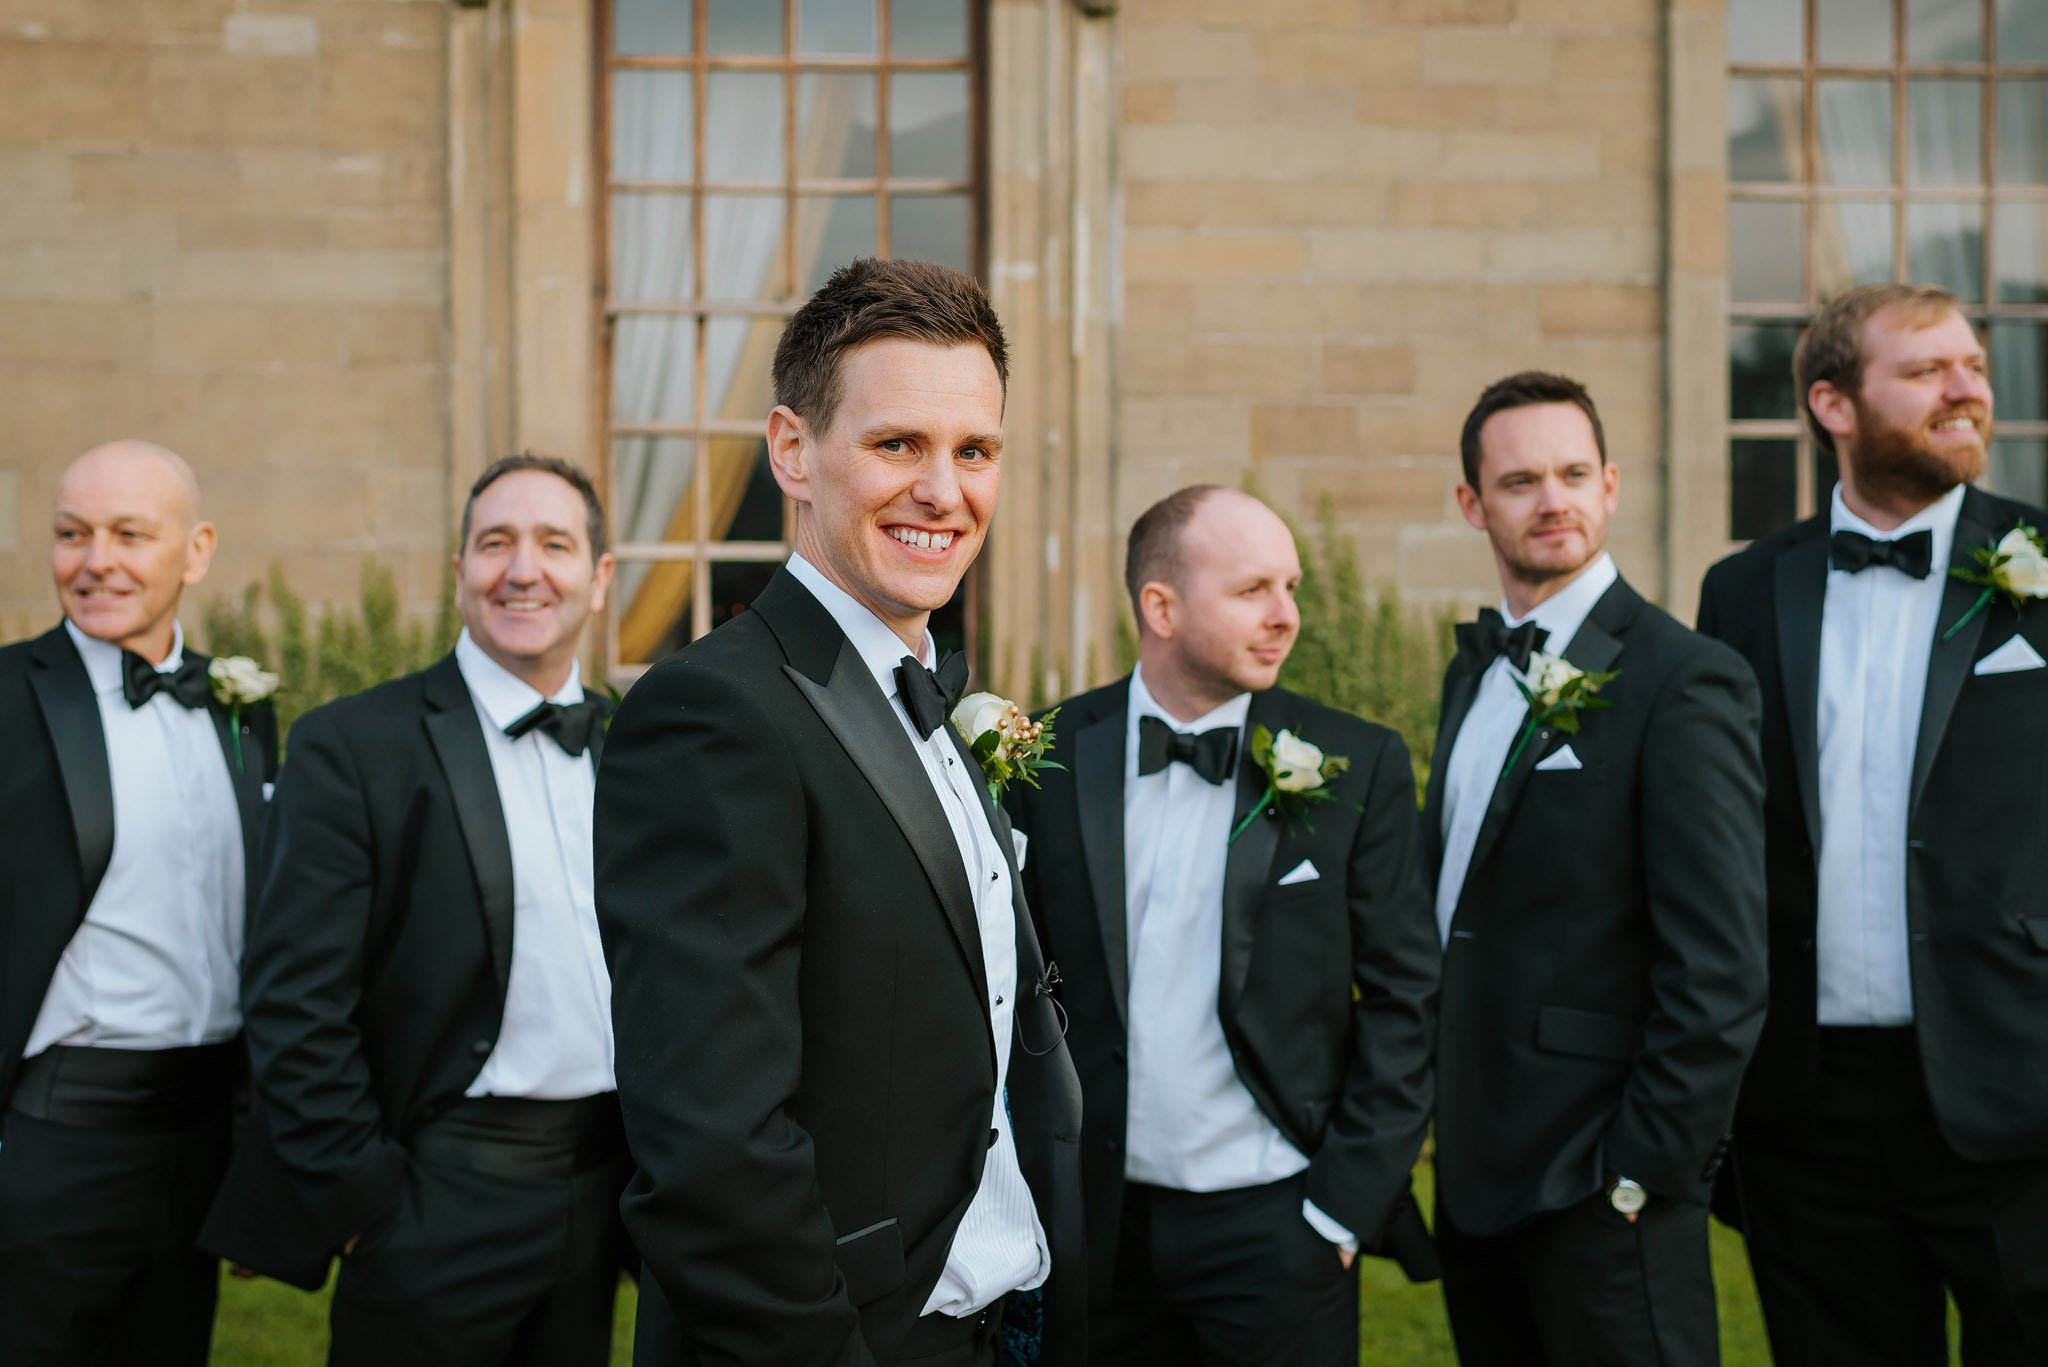 Coombe Abbey wedding in Coventry, Warwickshire - Sam + Matt 26